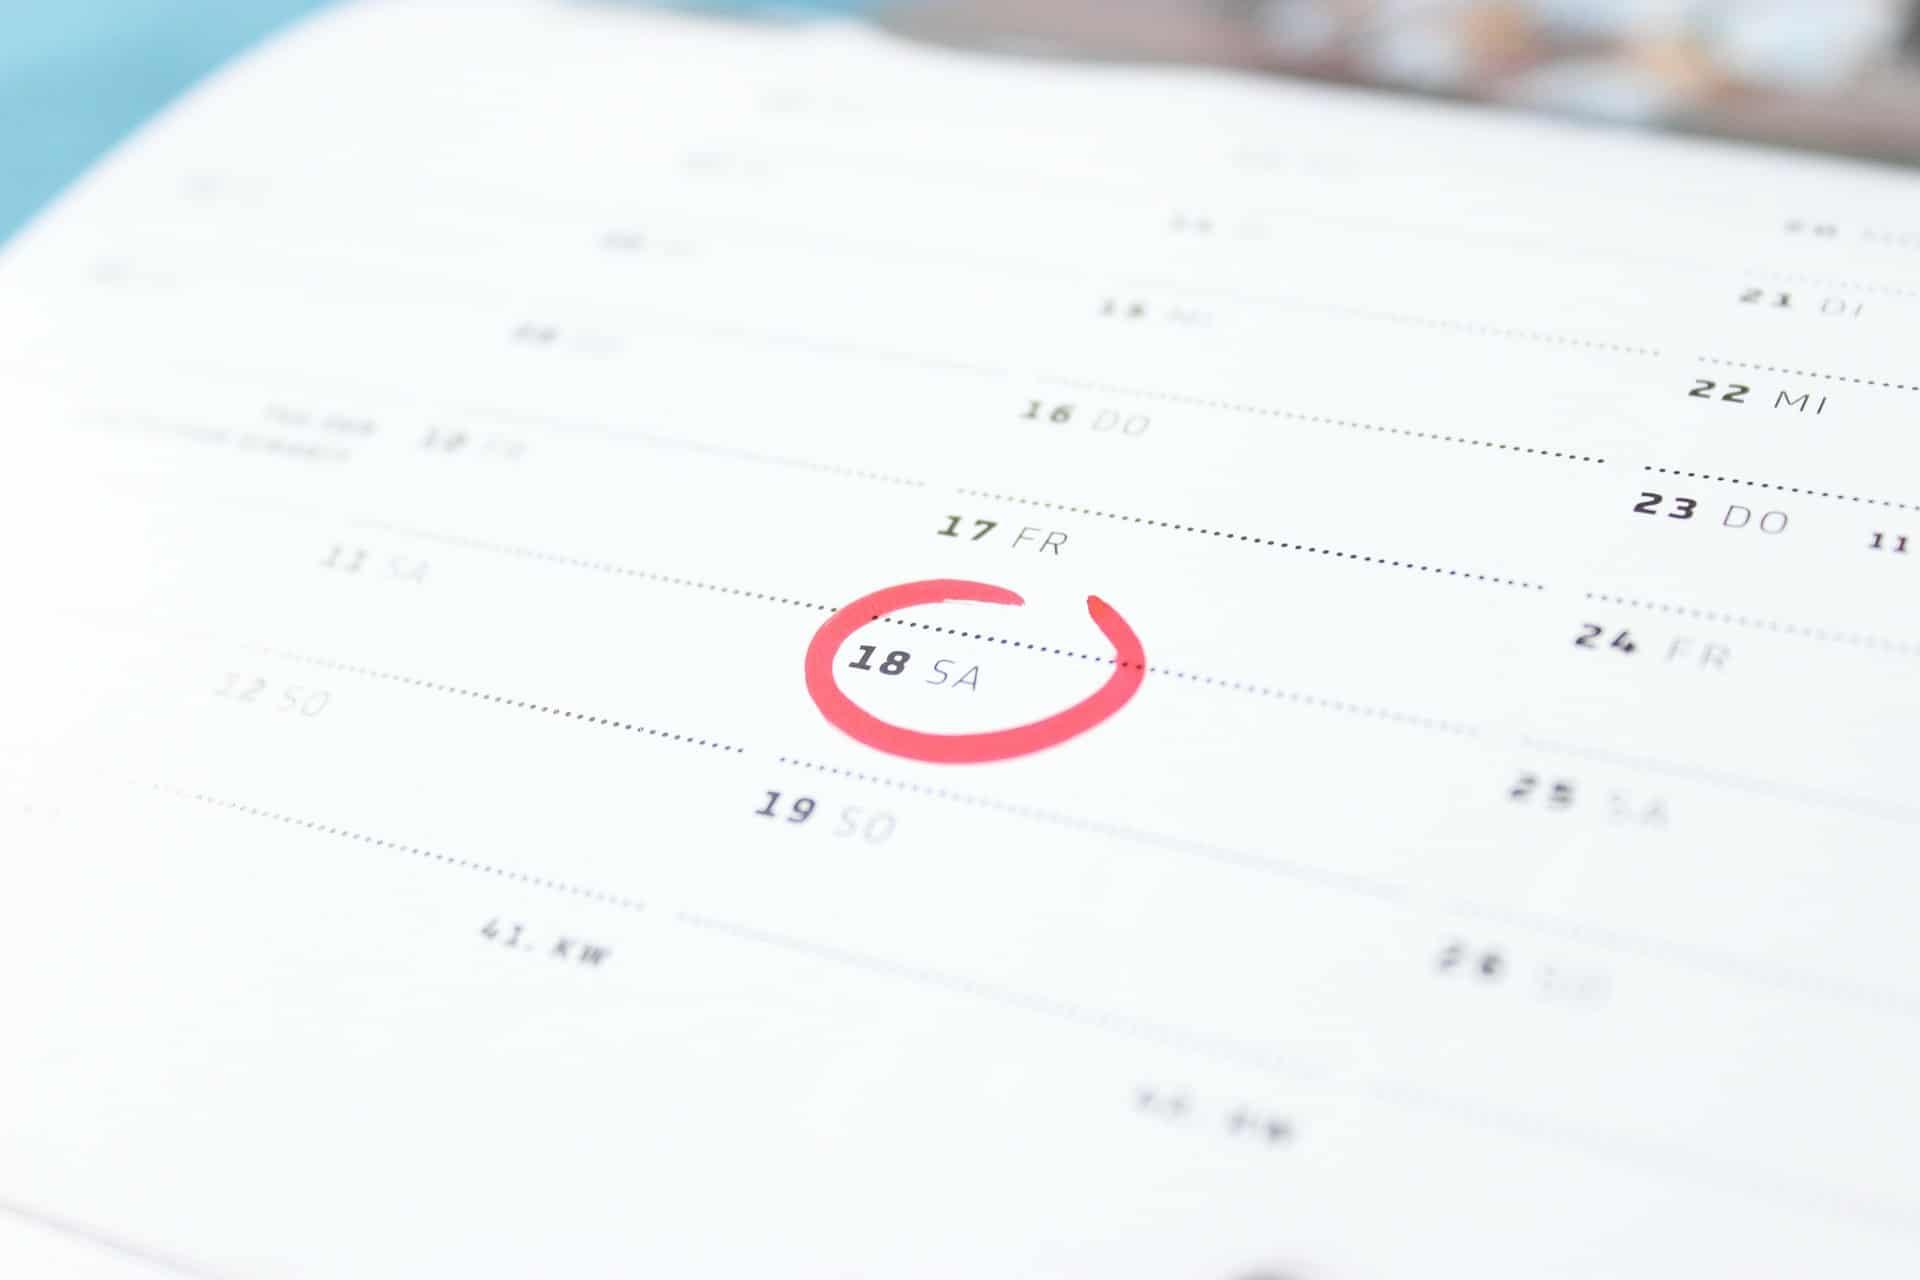 Calendario Anno 1992.Festivita 2019 Calendario Ponti Vacanze Pasqua